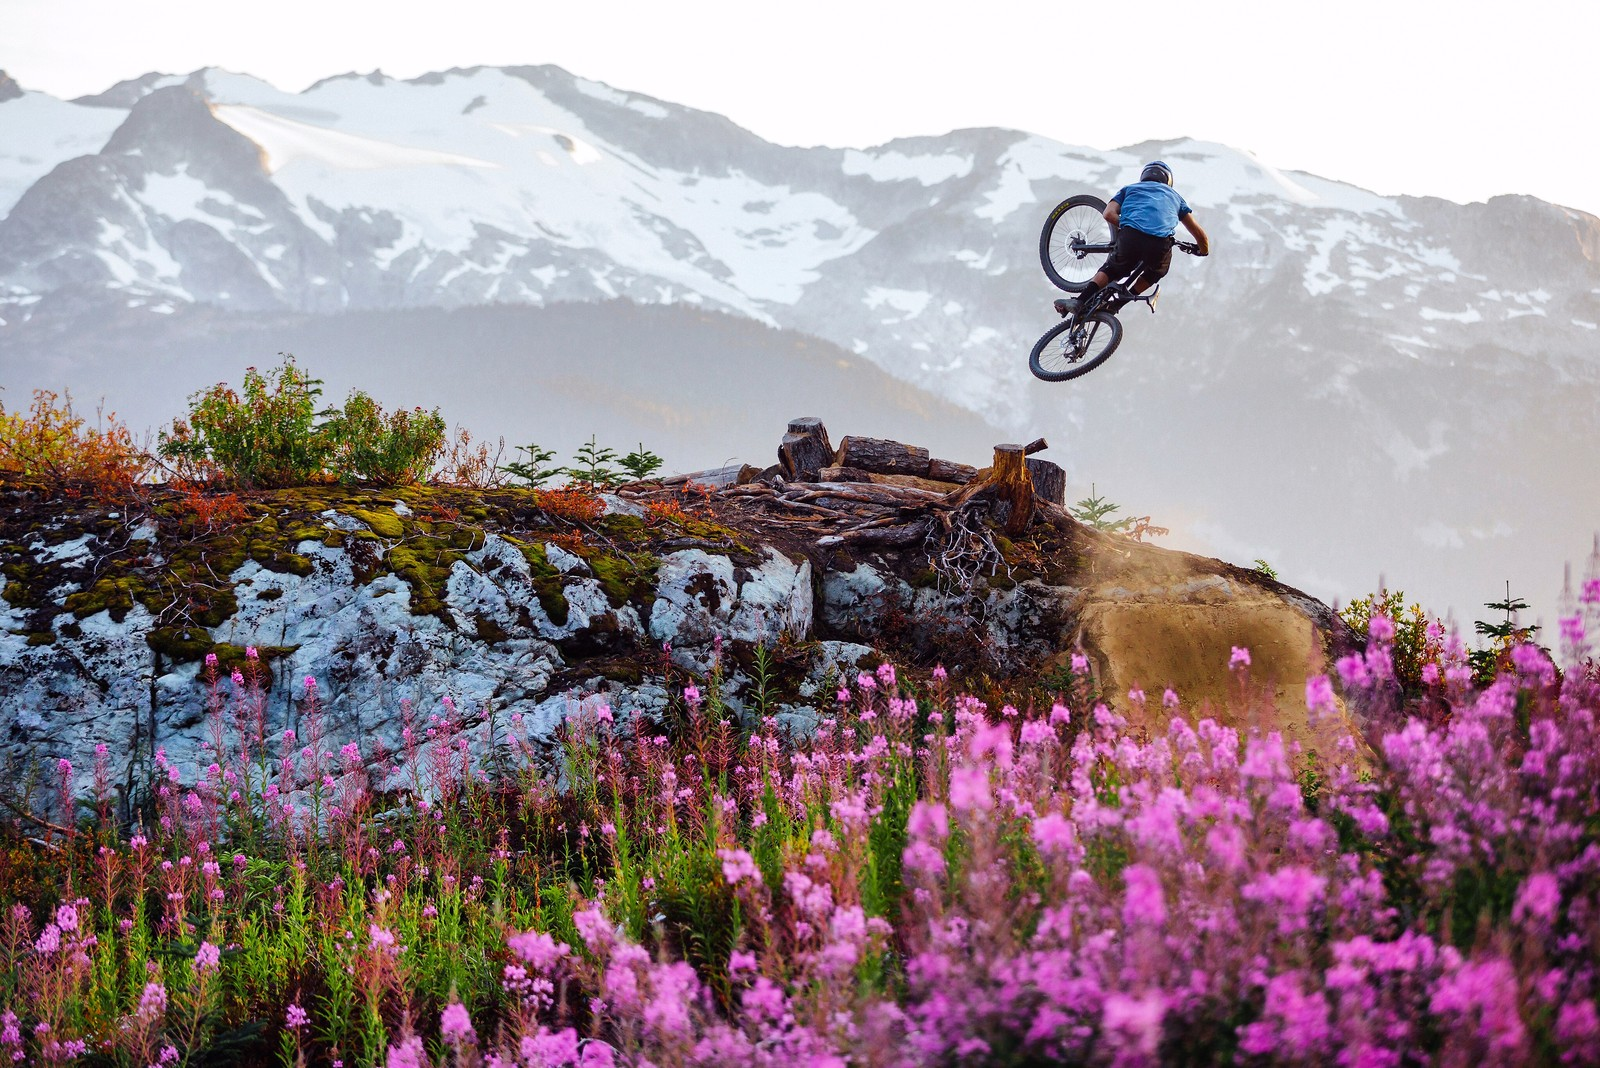 IMG 3959 - jnev - Mountain Biking Pictures - Vital MTB